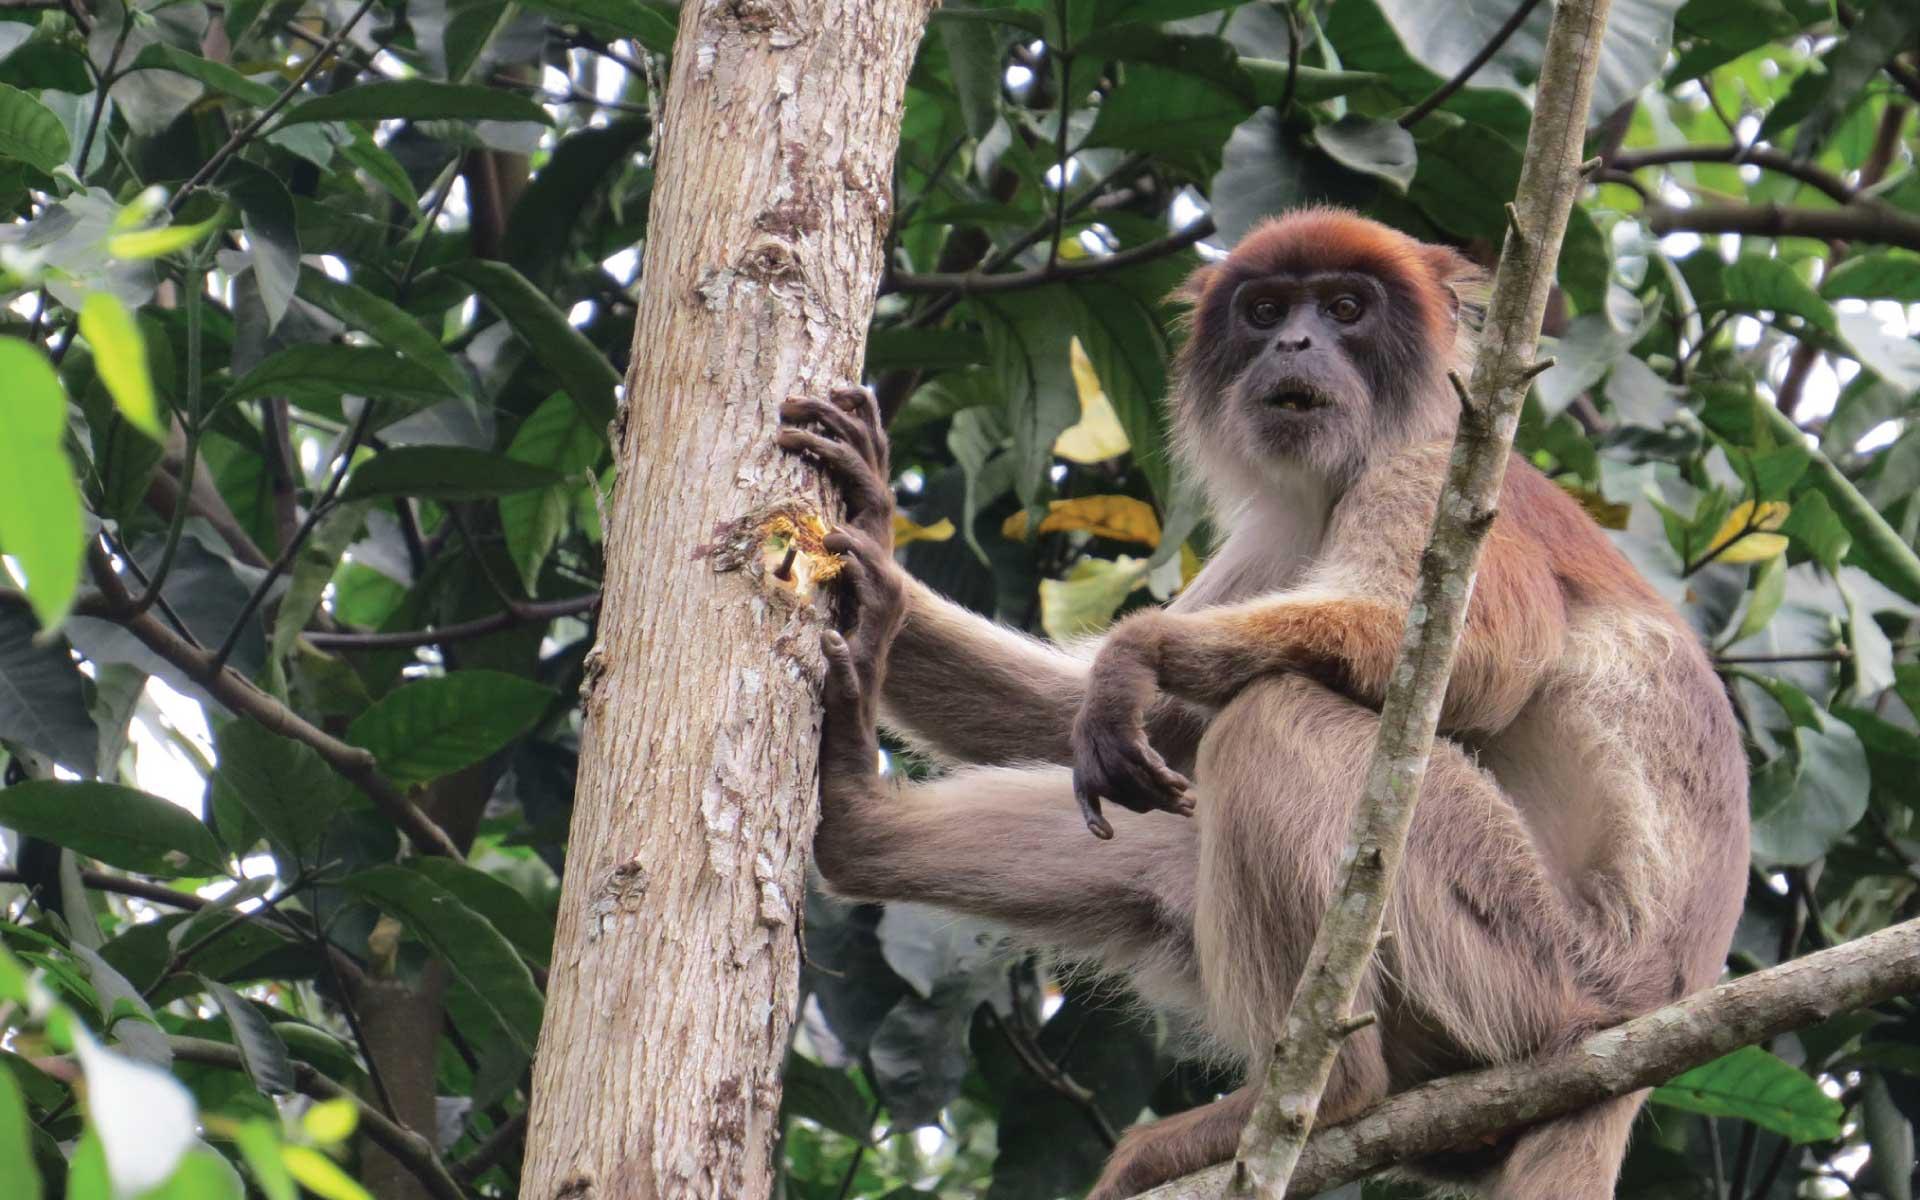 Bigodi Wetland Sanctuary Primates